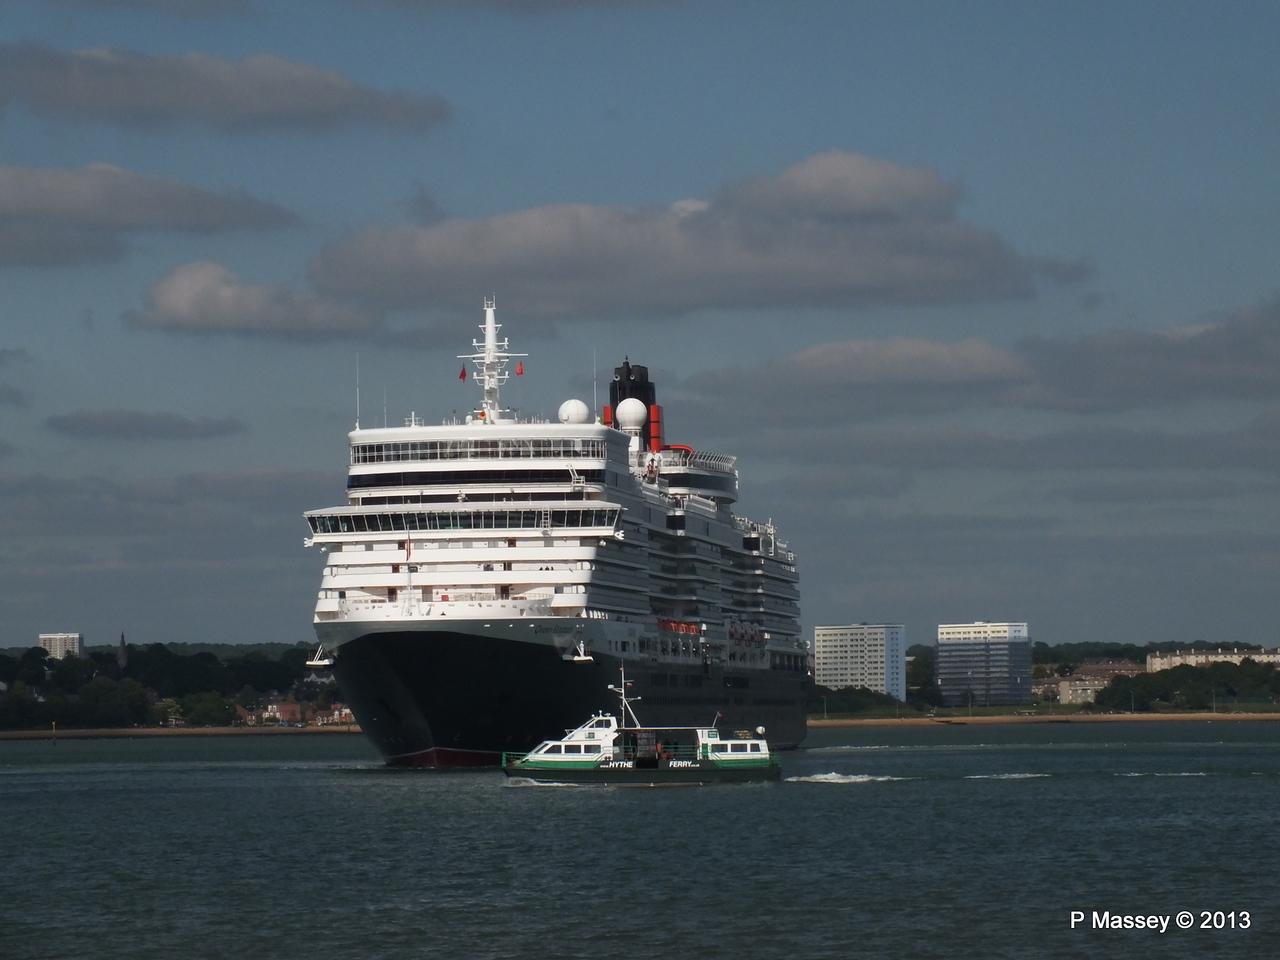 QUEEN ELIZABETH Departs Southampton PDM 09-06-2013 16-53-16